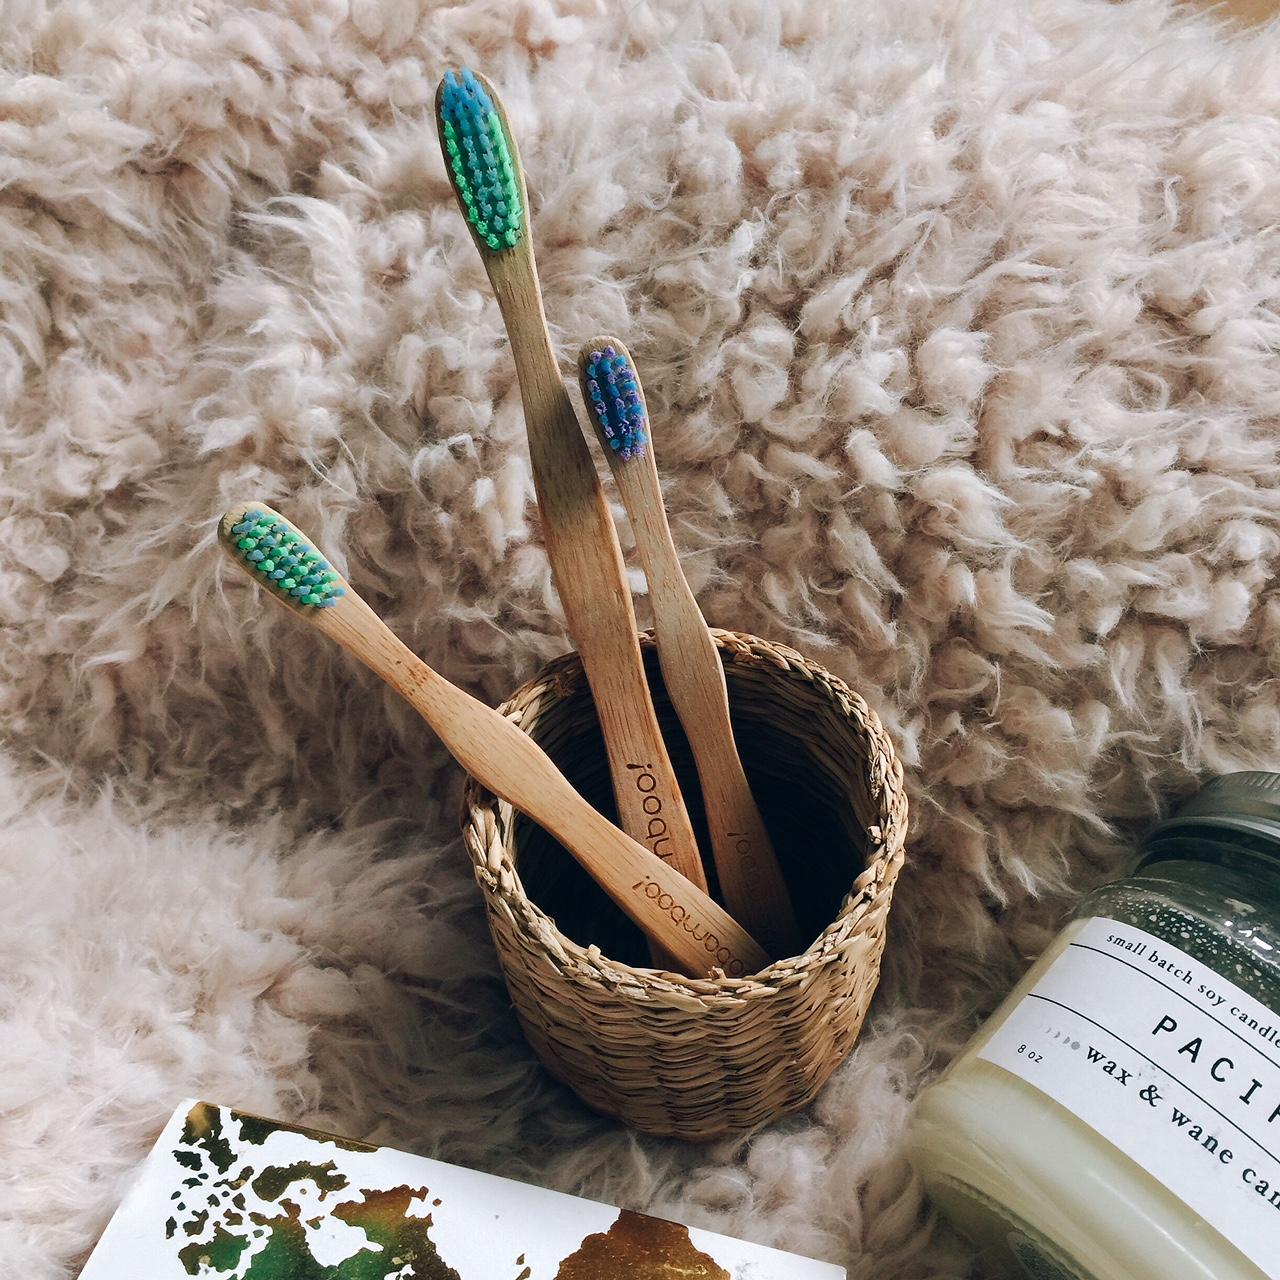 portland blogger, monthly favorites, fashion, beauty, music sza, bamboo toothbrush, white turtleneck, boohoo, online shopping